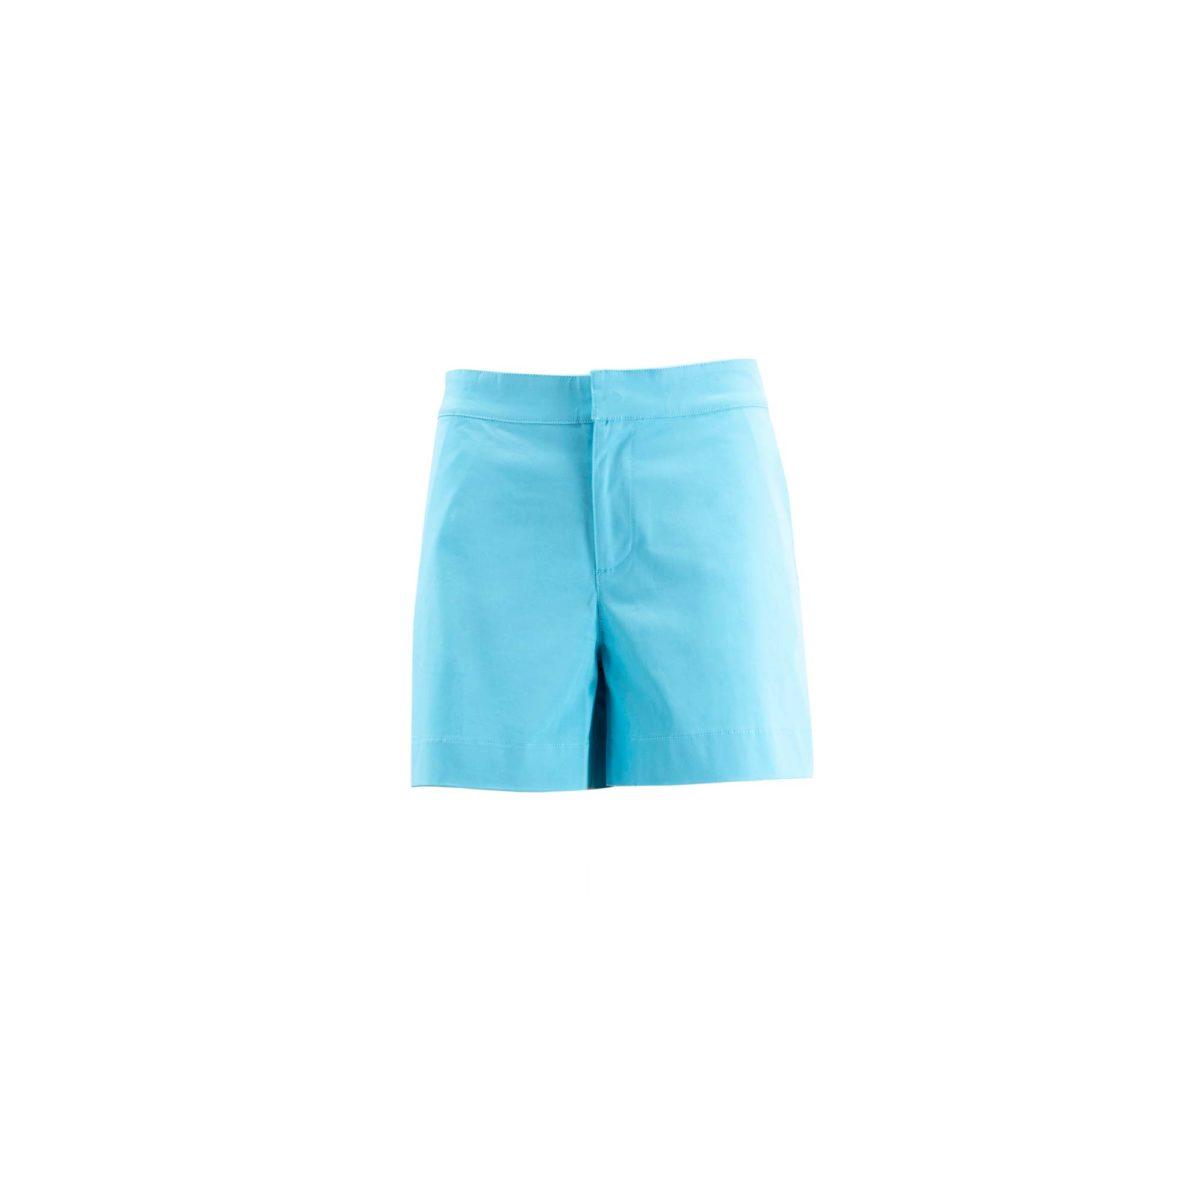 Shorts Classic Azzurro - vista frontale   Nicla